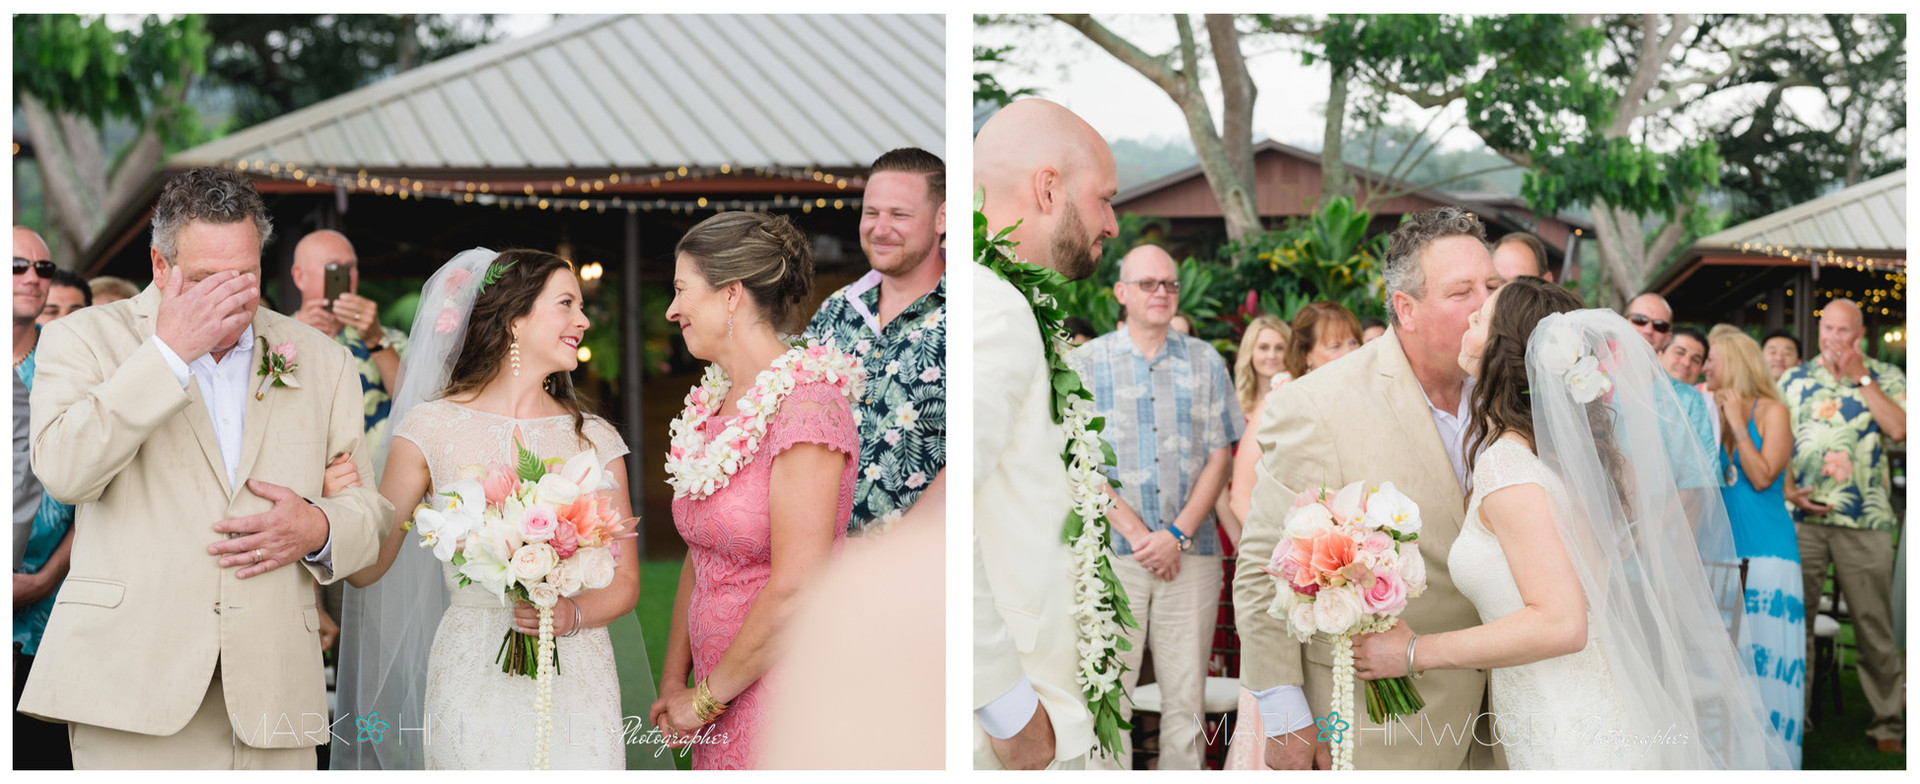 Top Big Island Wedding Photographer 25.j